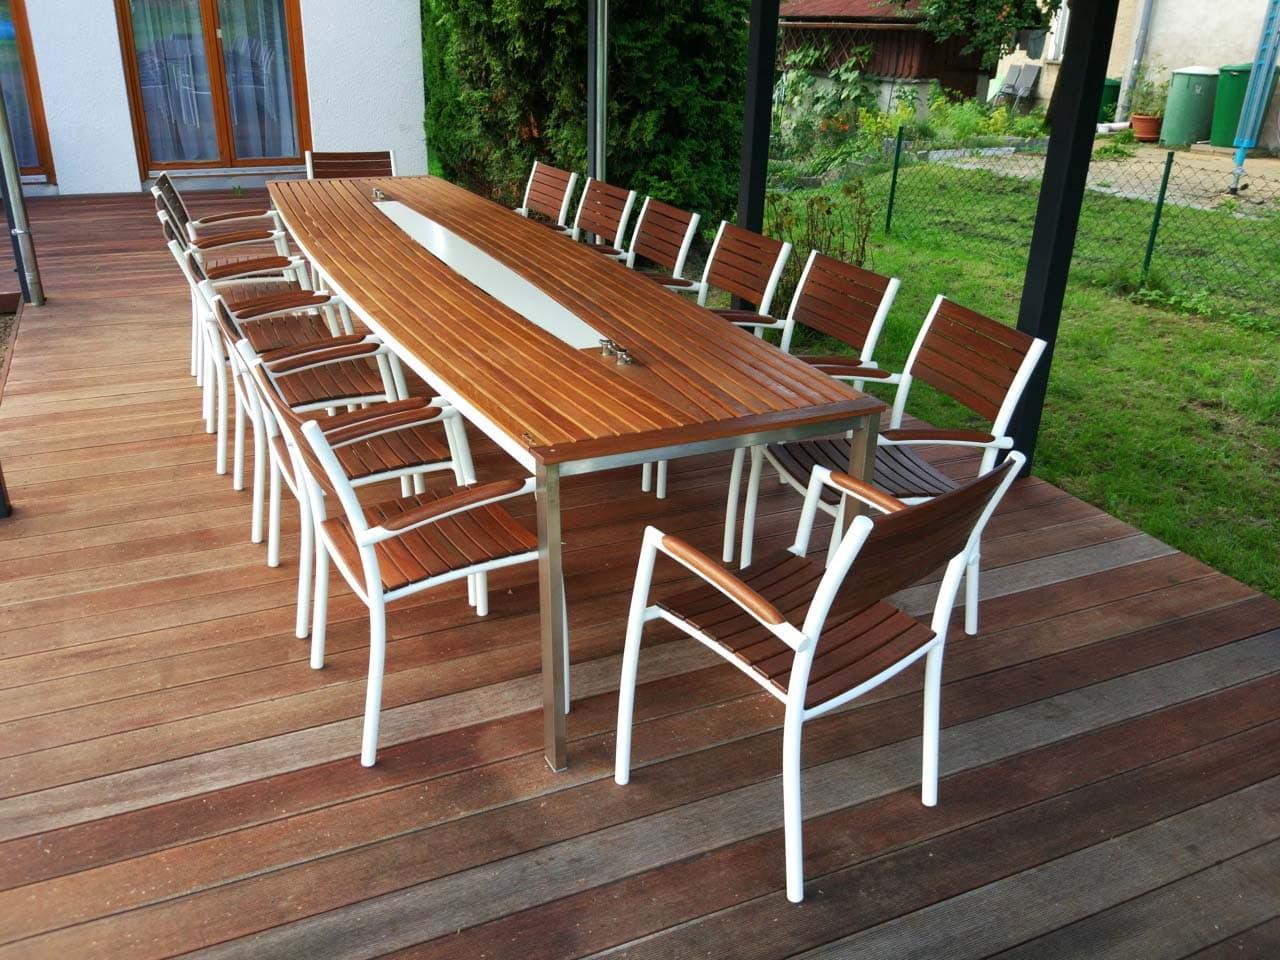 Design Tisch Sealine Nummer 6 aus Metall Holz Teak by Sebastian Bohry timeless design